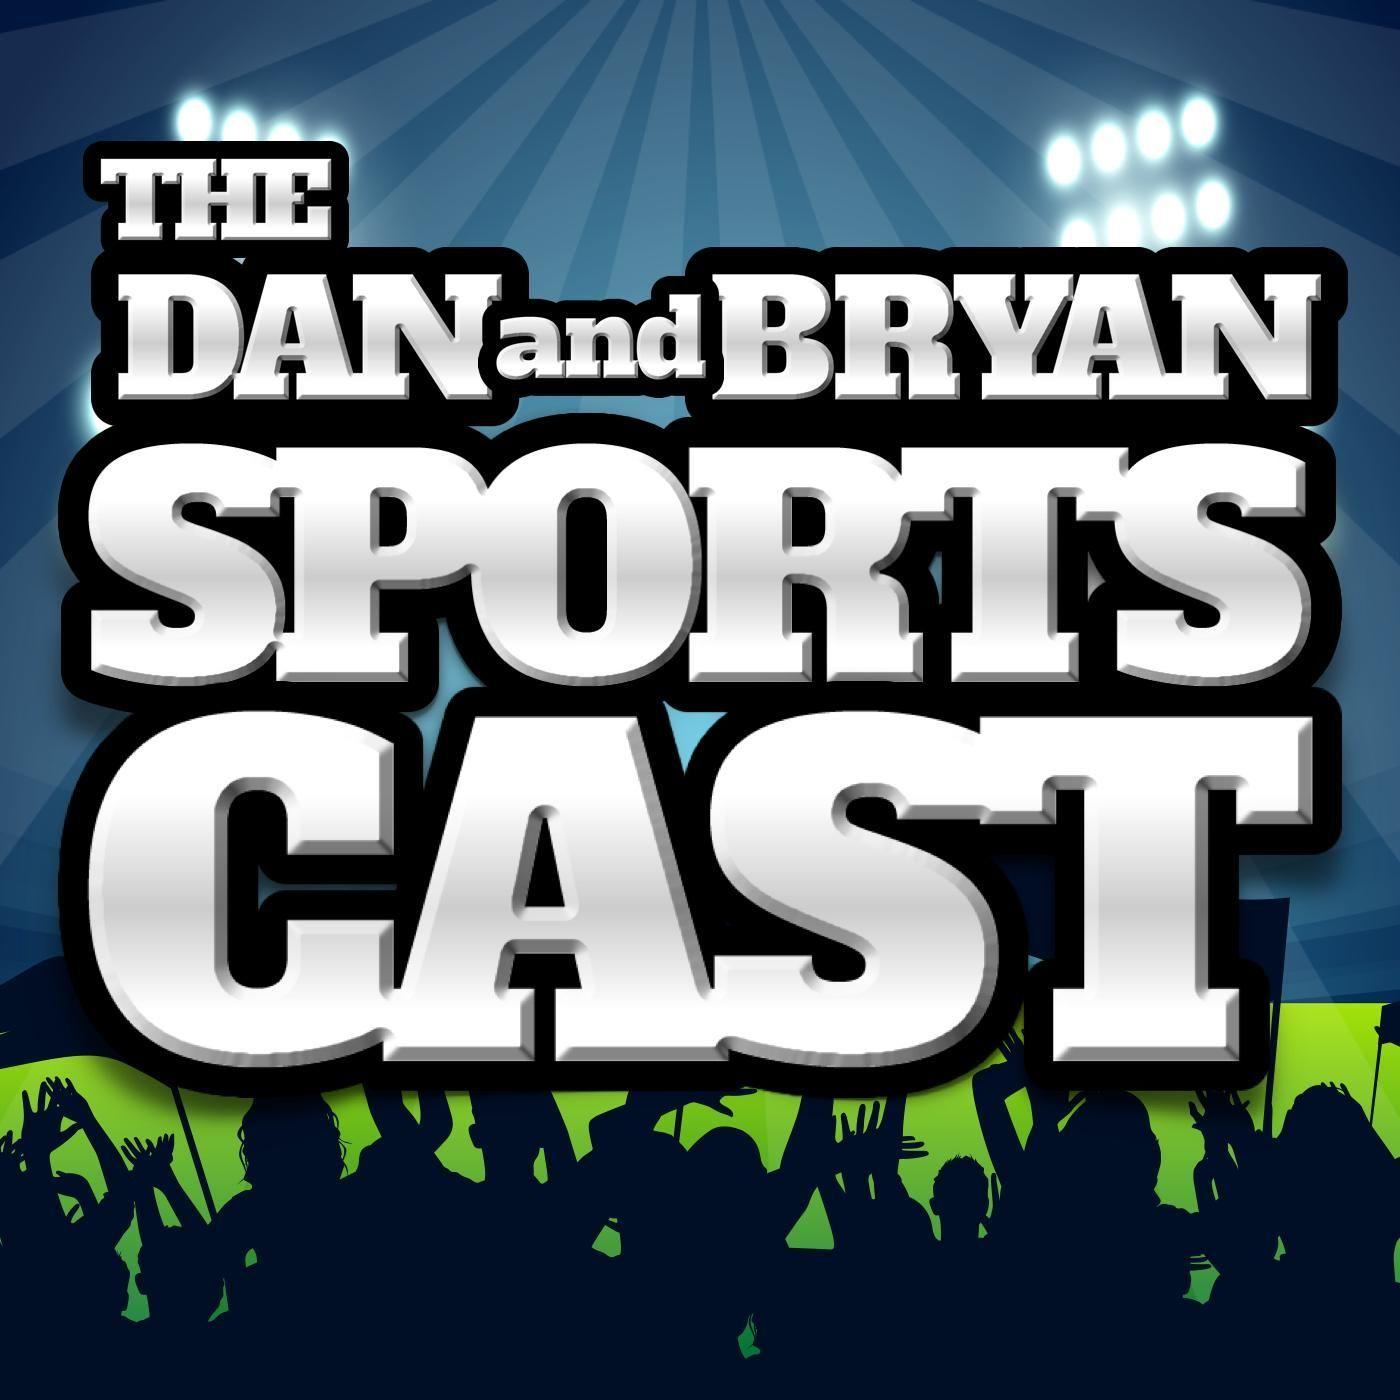 057: Update on Dan and Bryan